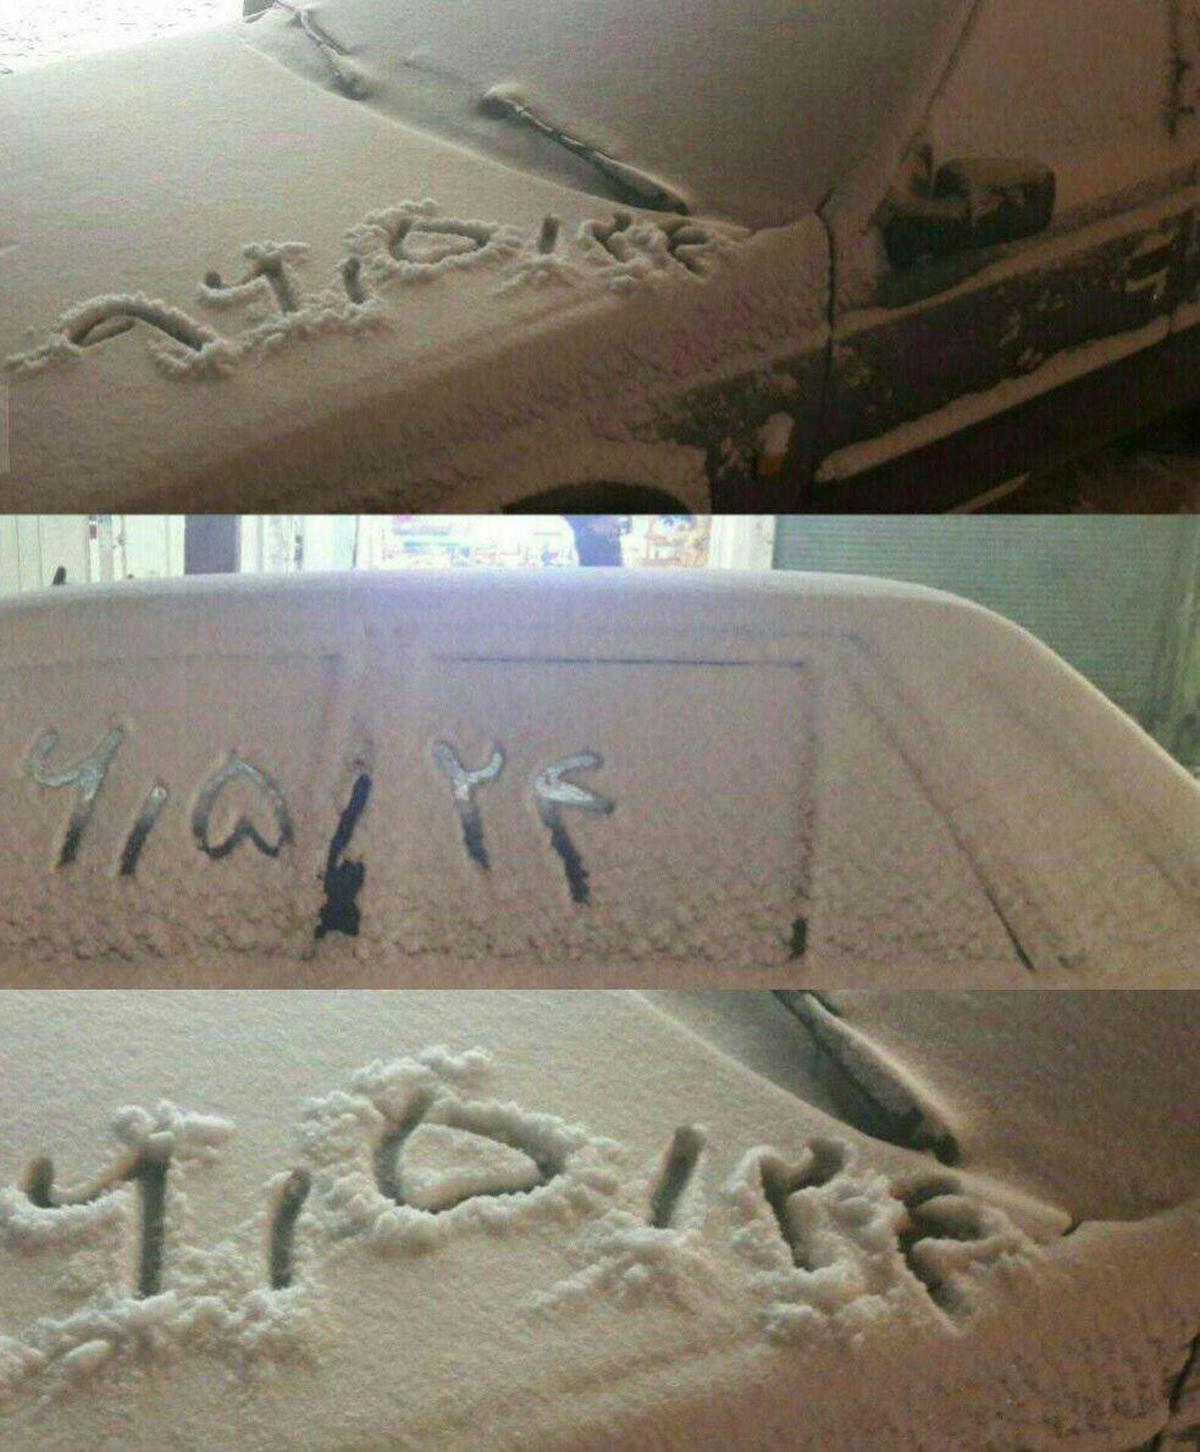 بارش برف در ارتفاعات لاهور خیاو